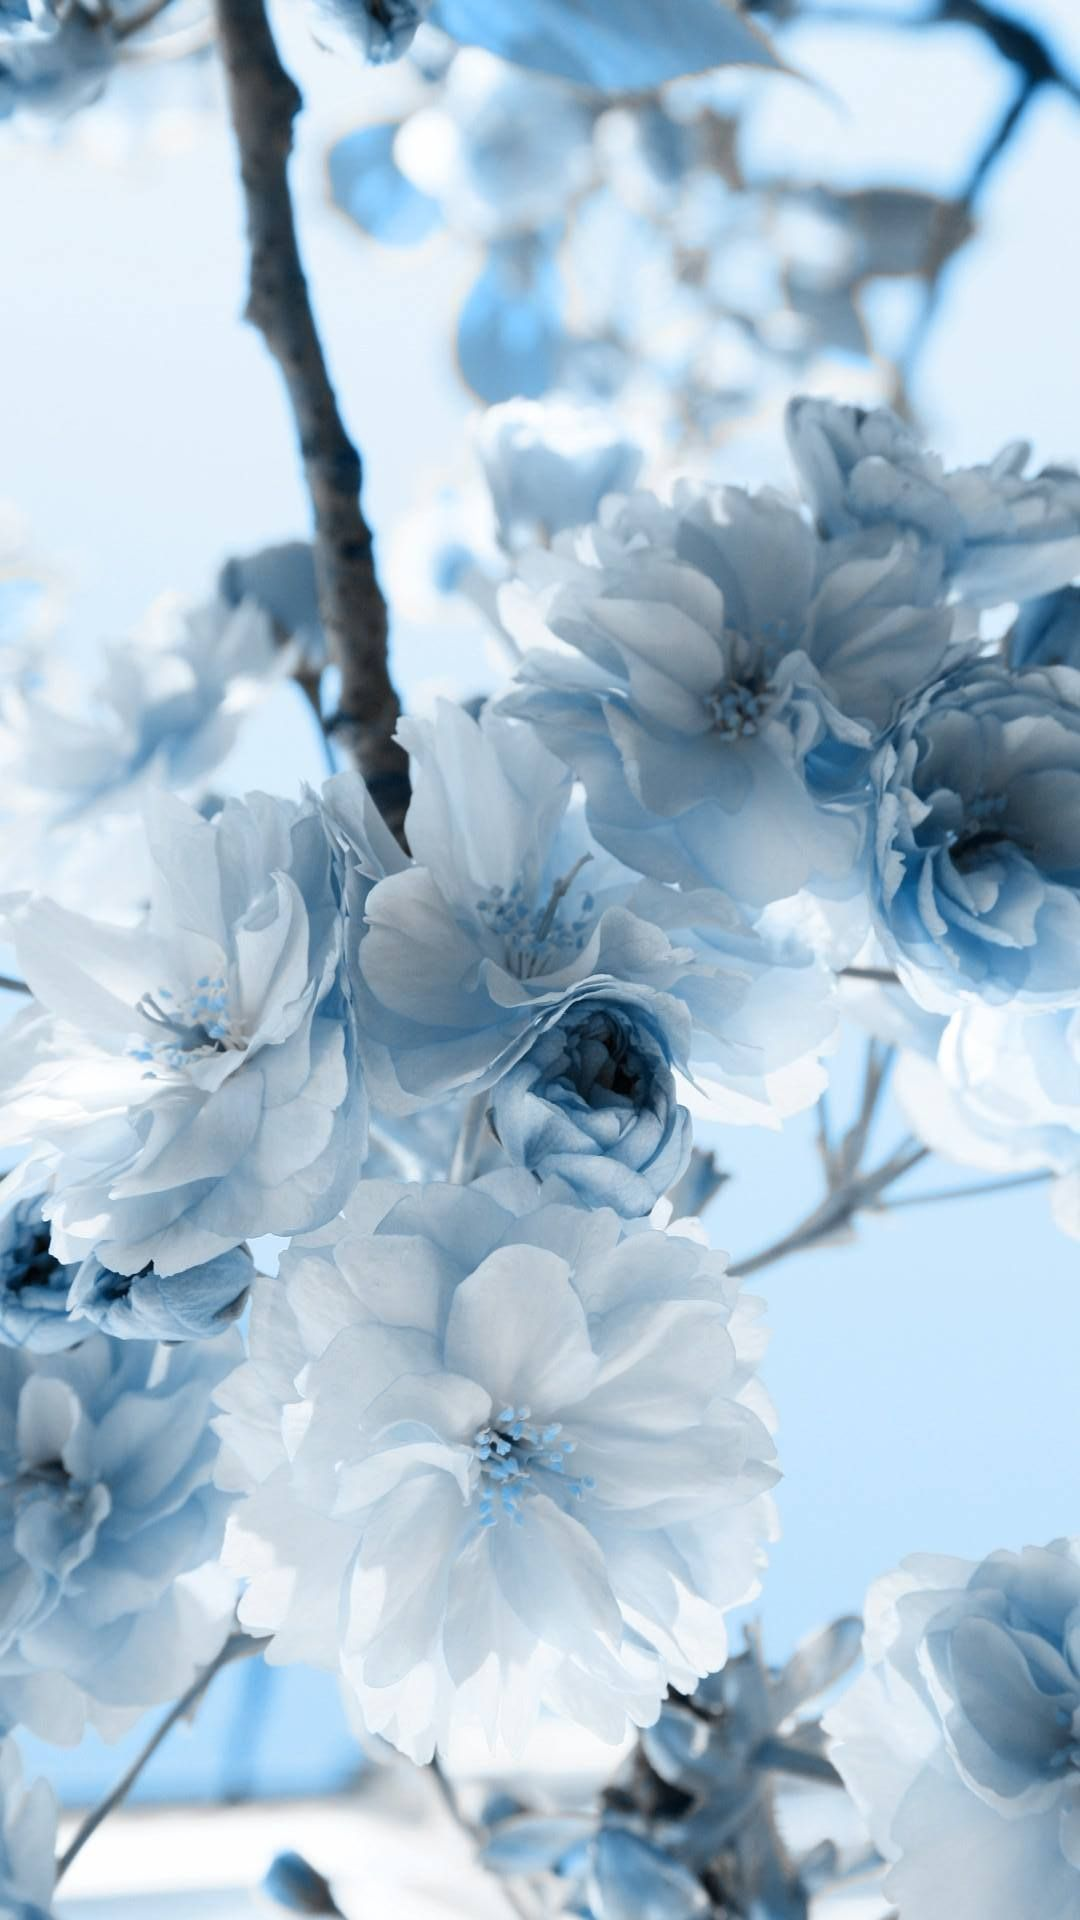 Pastel Blue Flower Wallpapers Top Free Pastel Blue Flower Backgrounds Wallpaperaccess